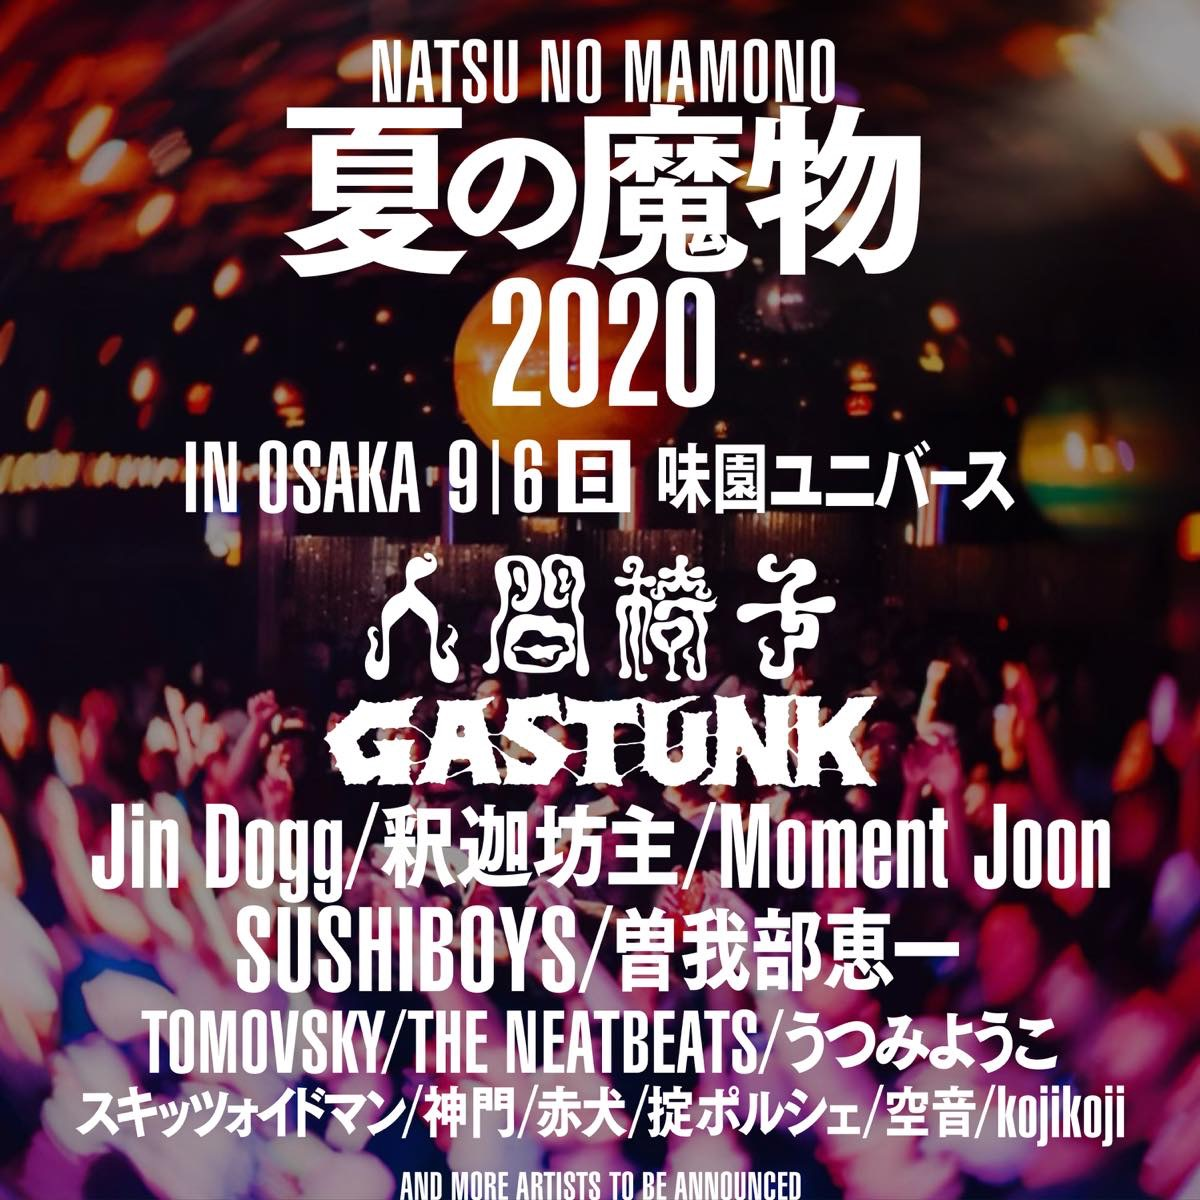 GASTUNK 夏の魔物2020 in OSAKA出演!